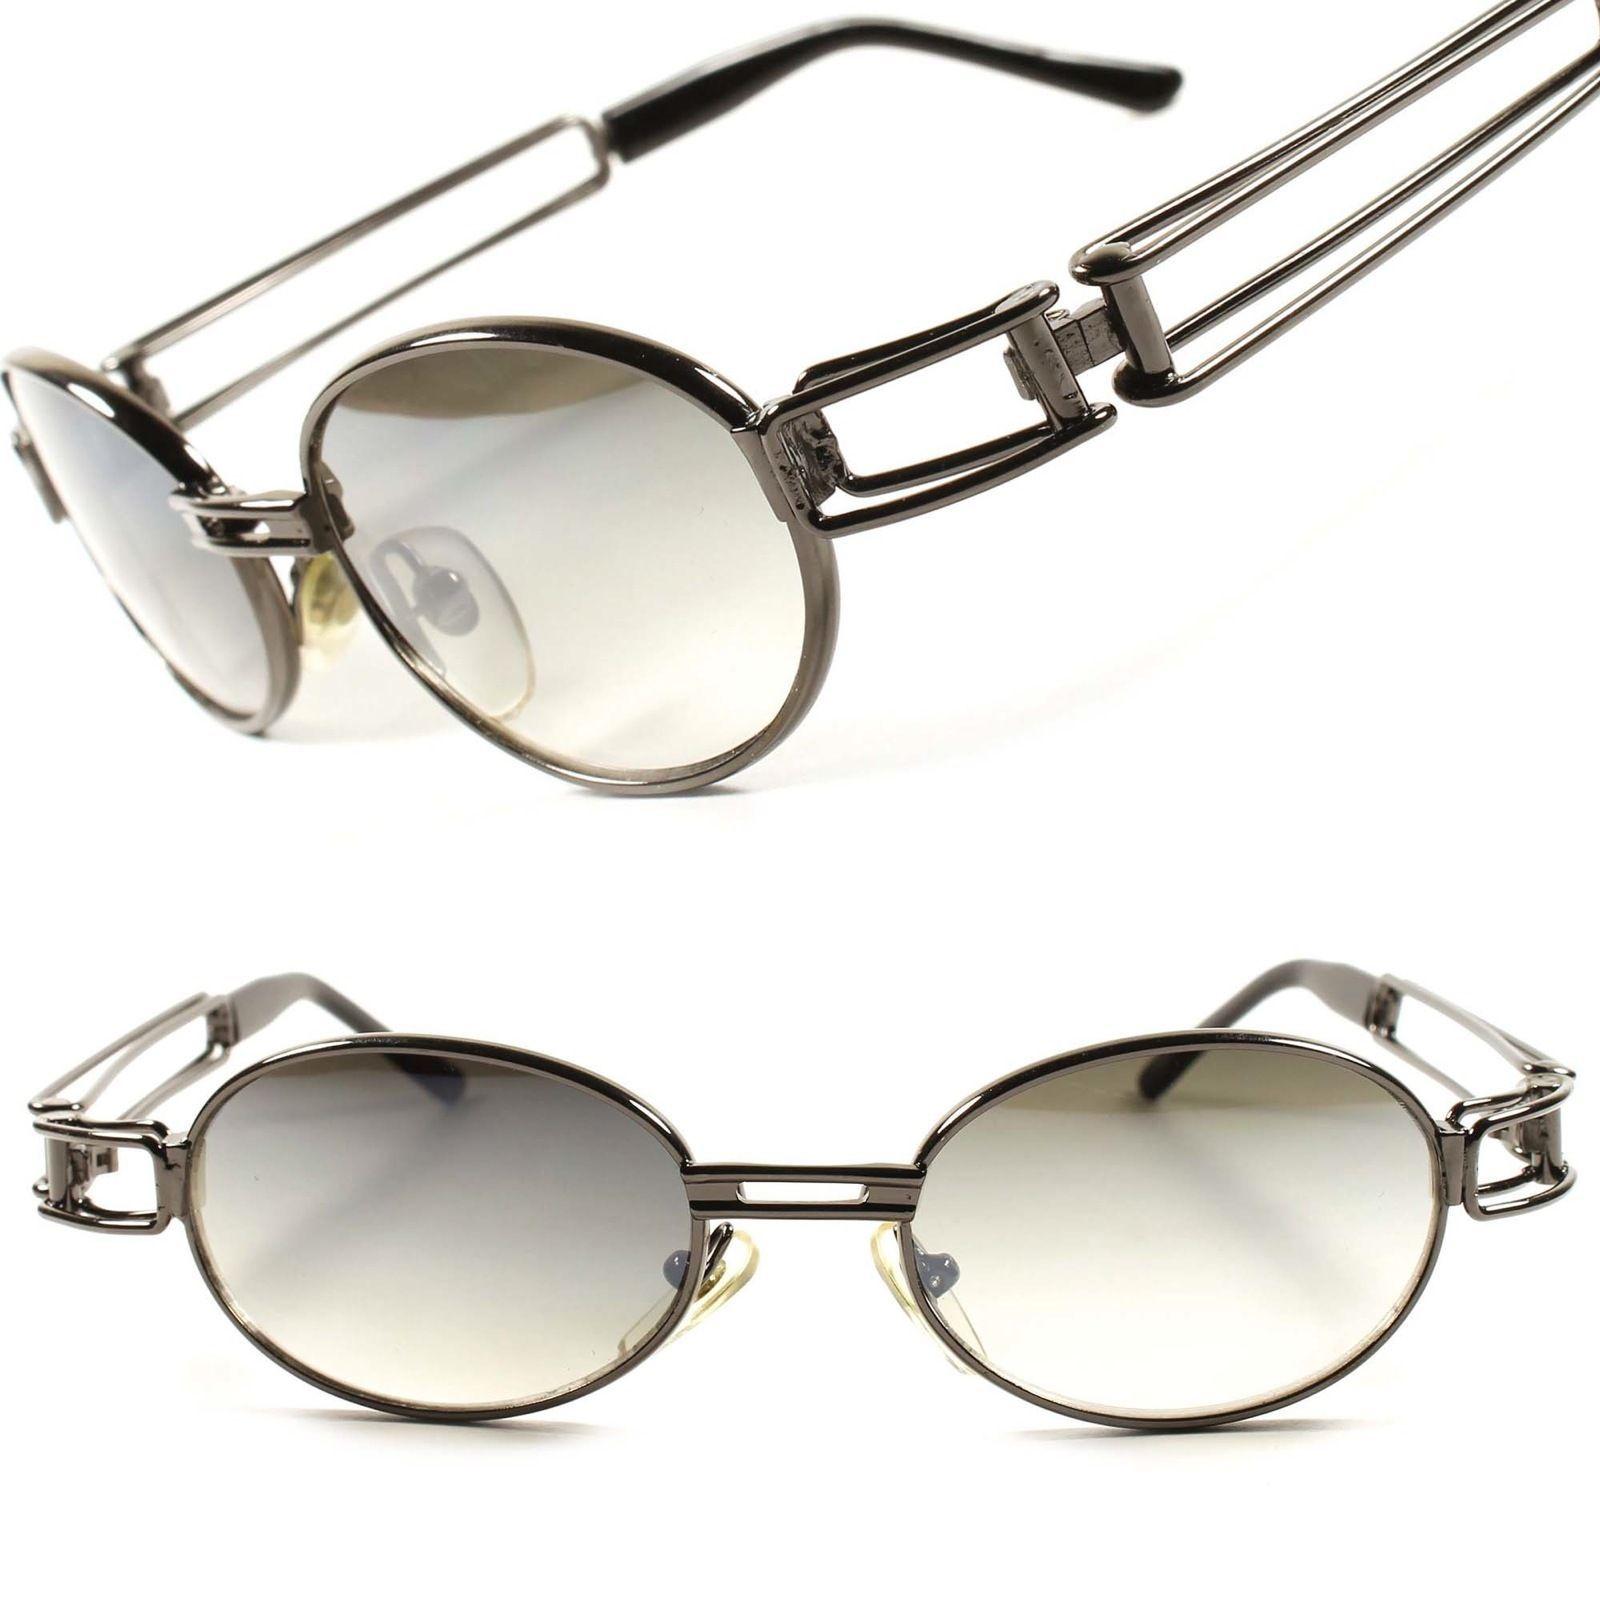 ecf93b8c5e72 Classic Old School Vintage Retro Mens Womens Oval Round Sunglasses Frame  D54B